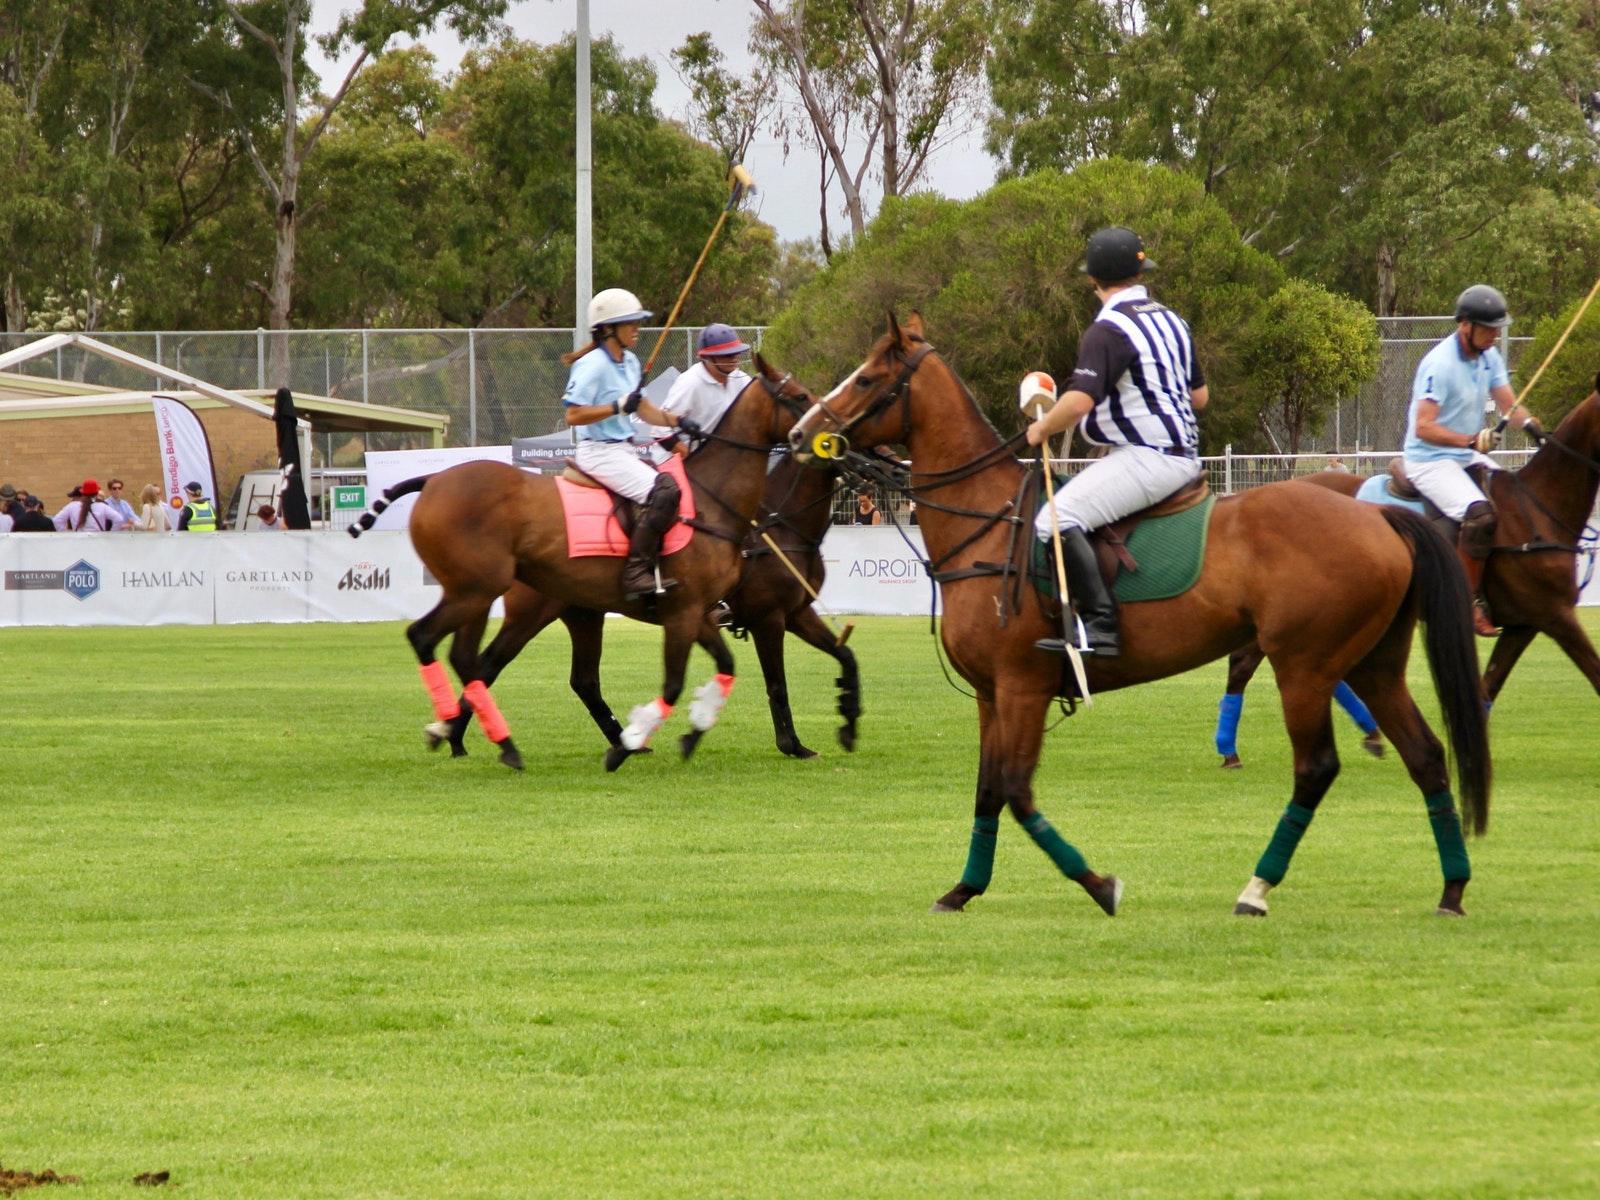 Horse polo match